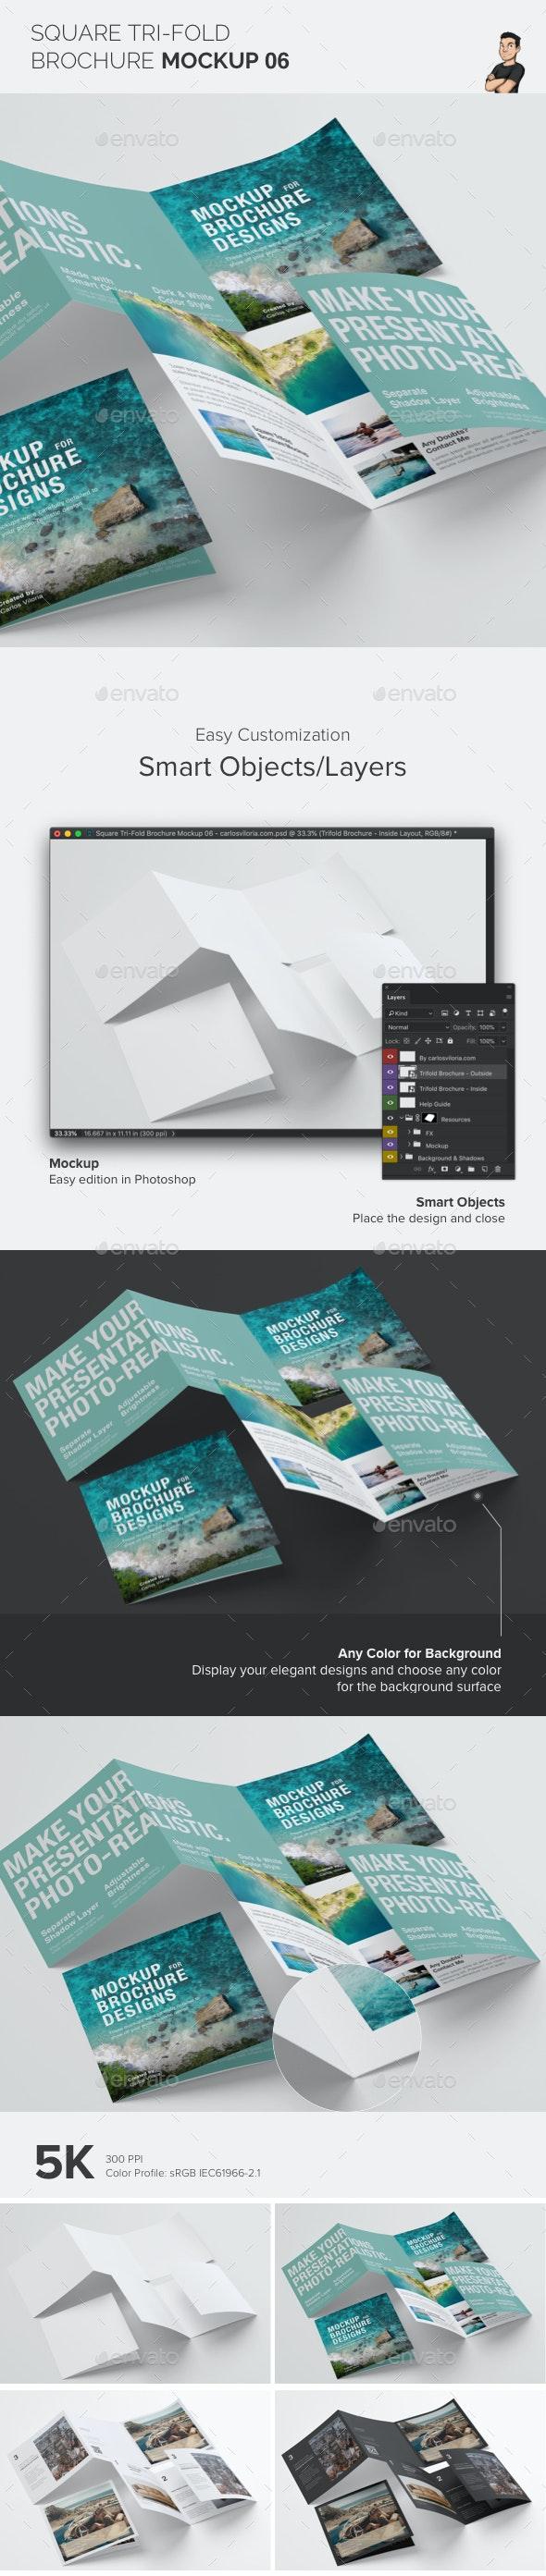 Square Trifold Brochure Mockup 06 - Stationery Print